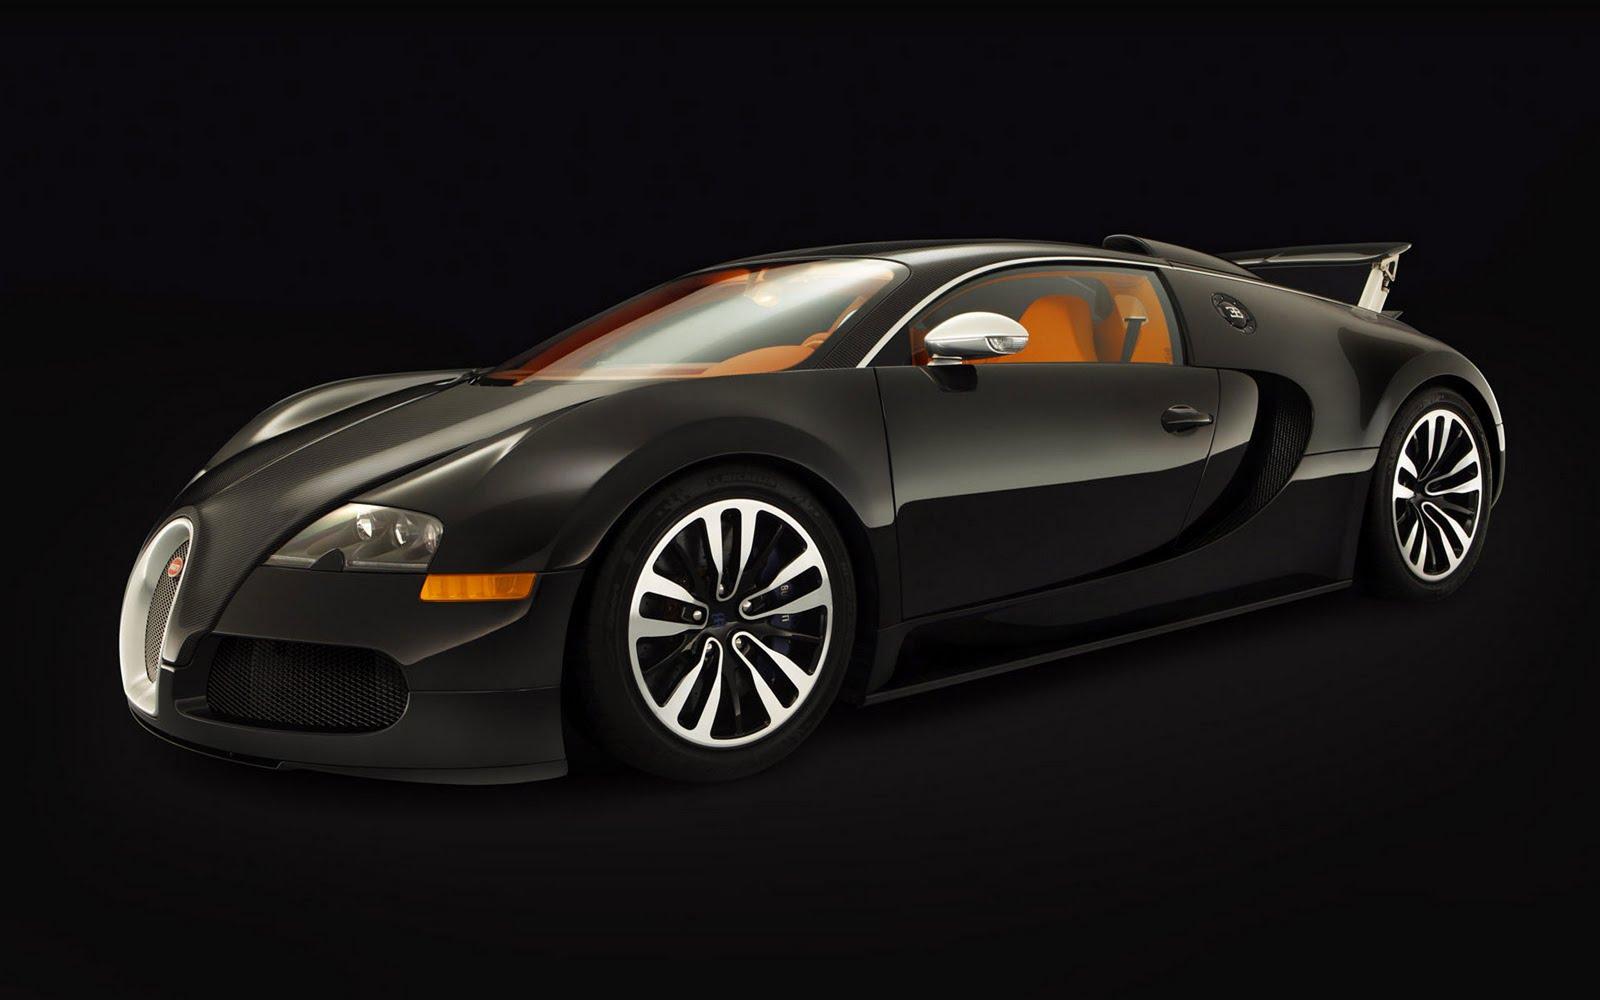 video games gran turismo bugatti veyron. Black Bedroom Furniture Sets. Home Design Ideas